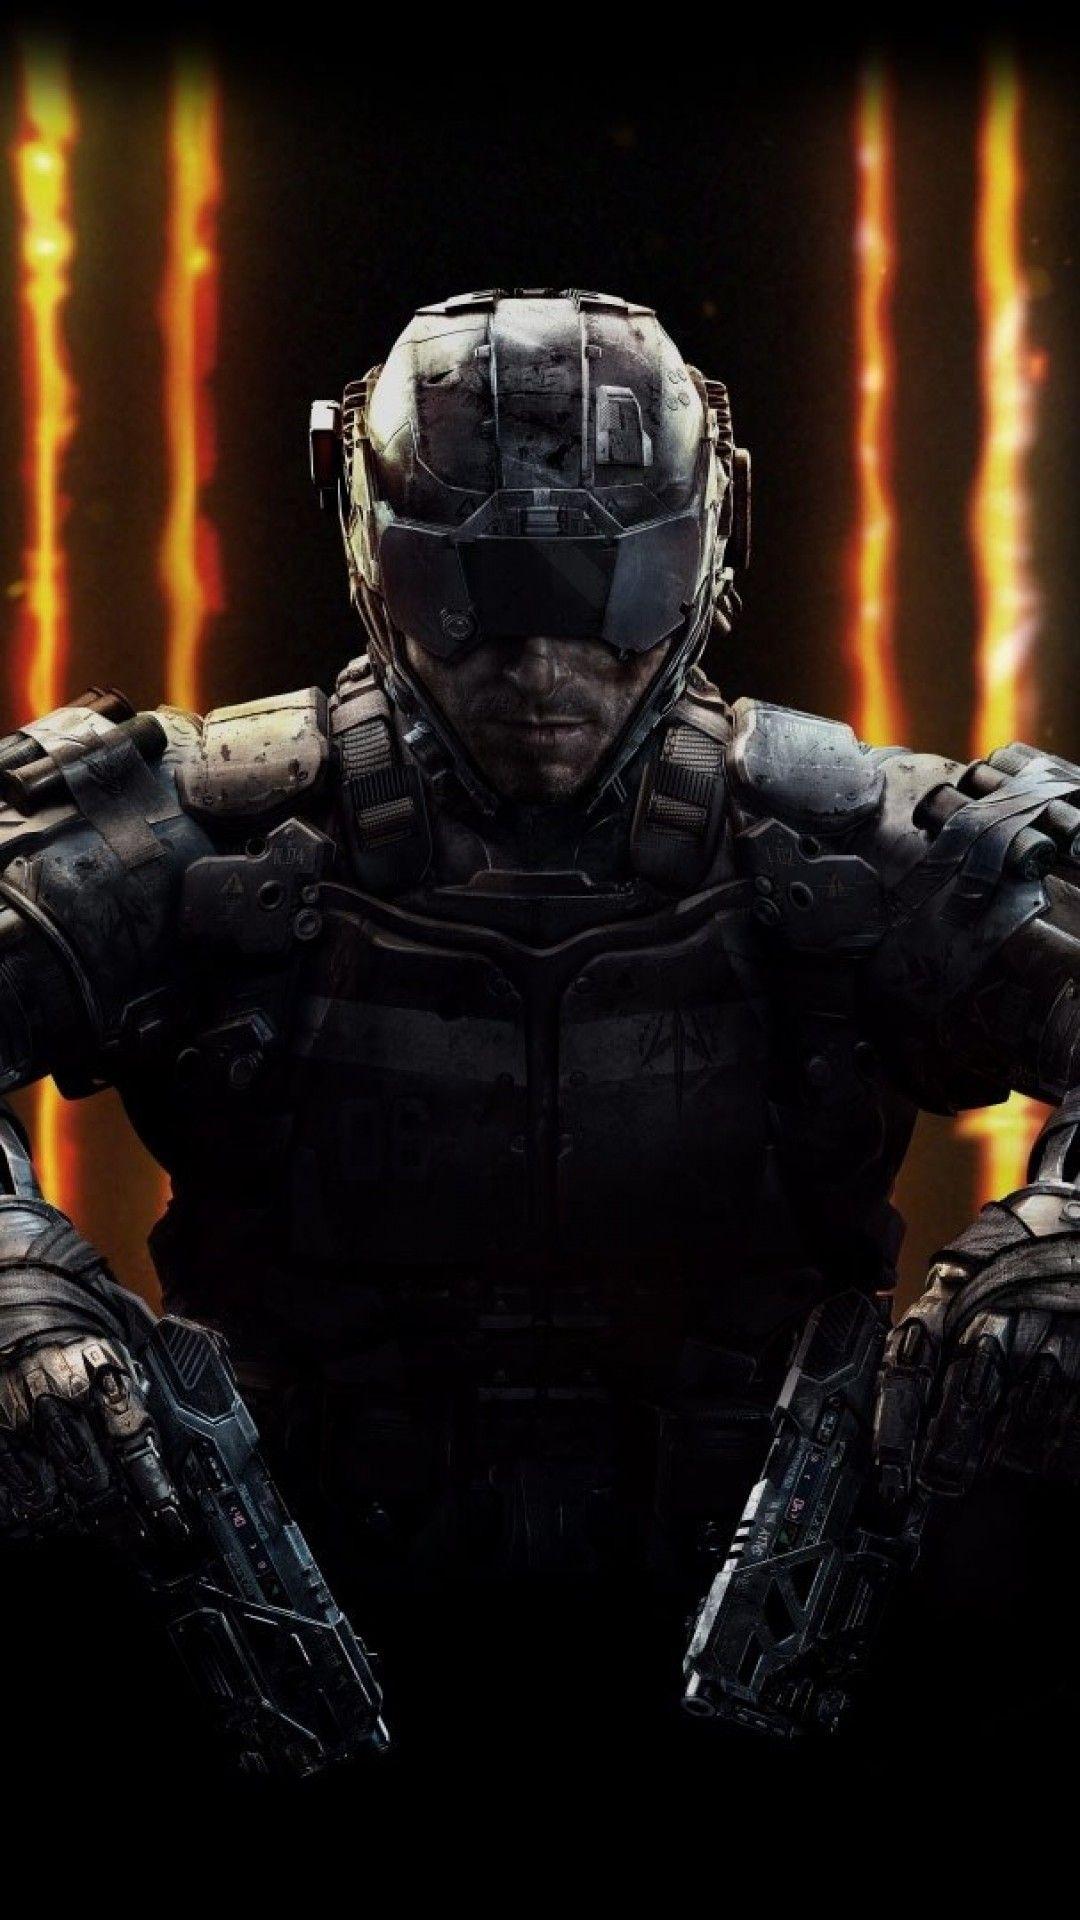 Spectre Call Of Duty Black Ops 3 Wallpaper Mobile En 2020 Fondos